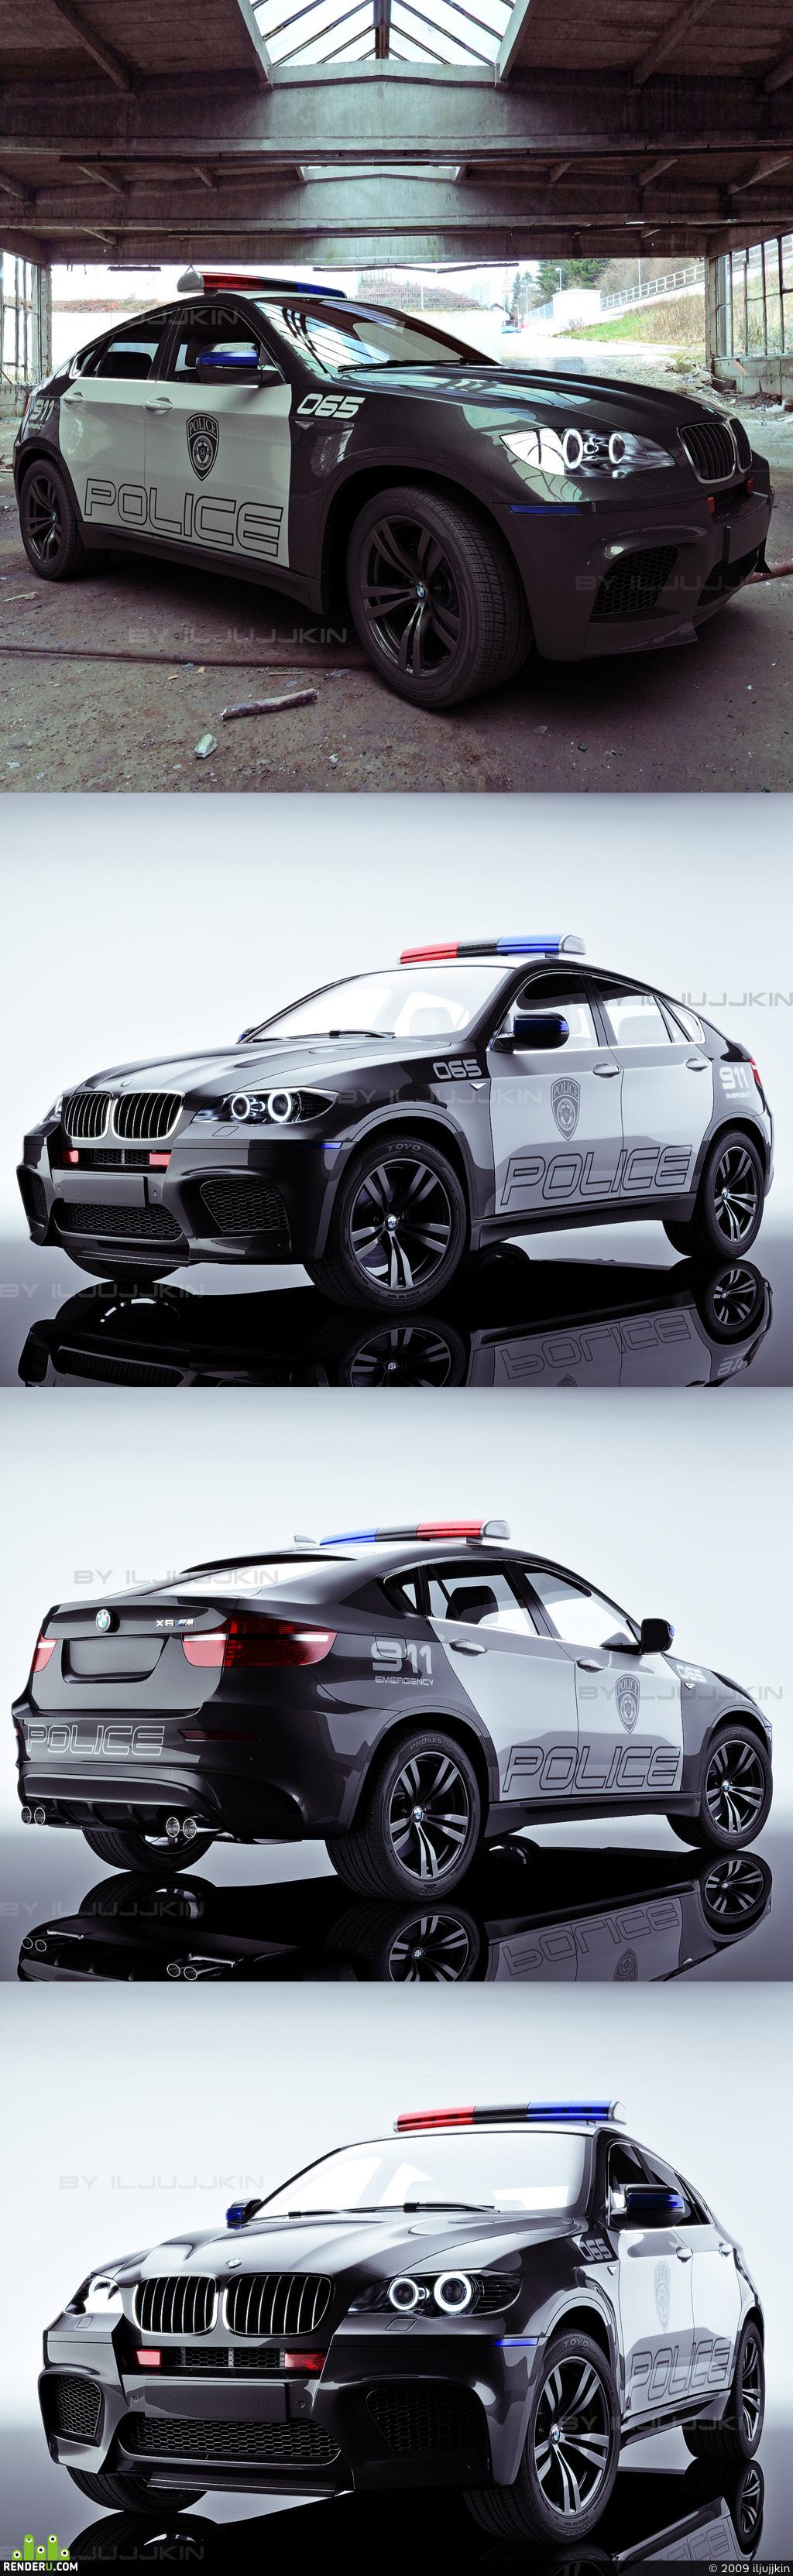 preview BWM X6 police car